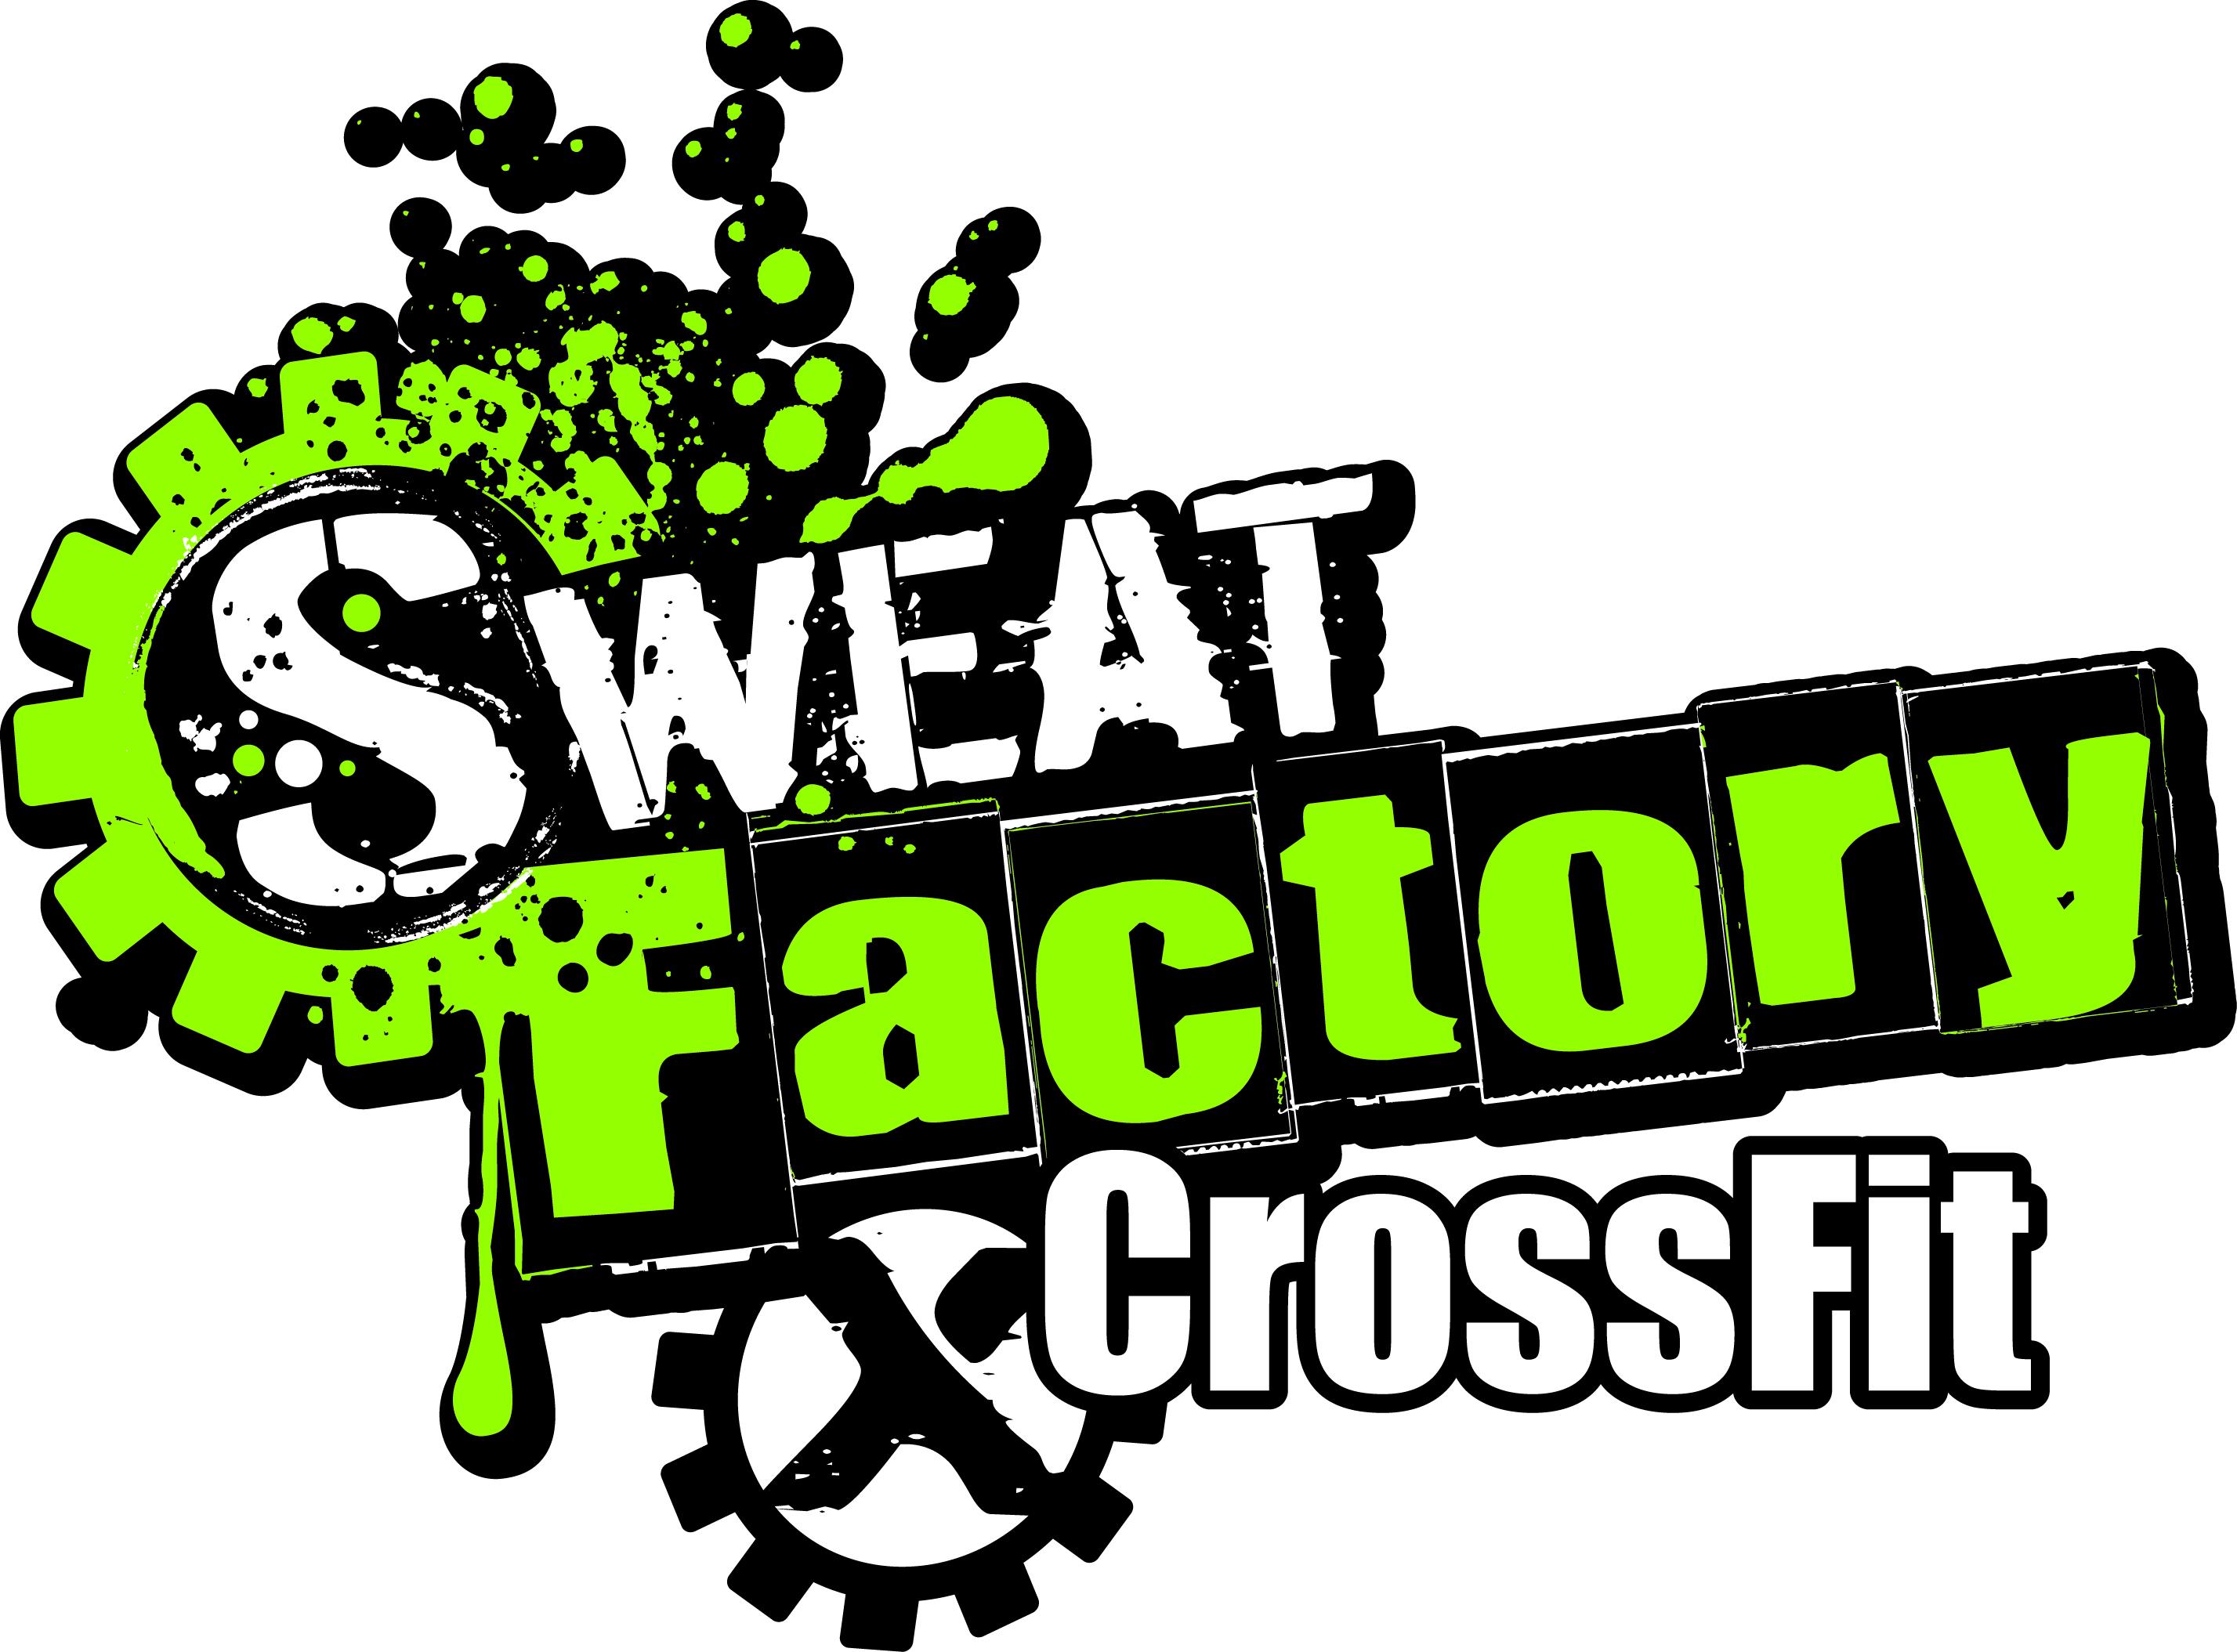 The Sweat Factory logo